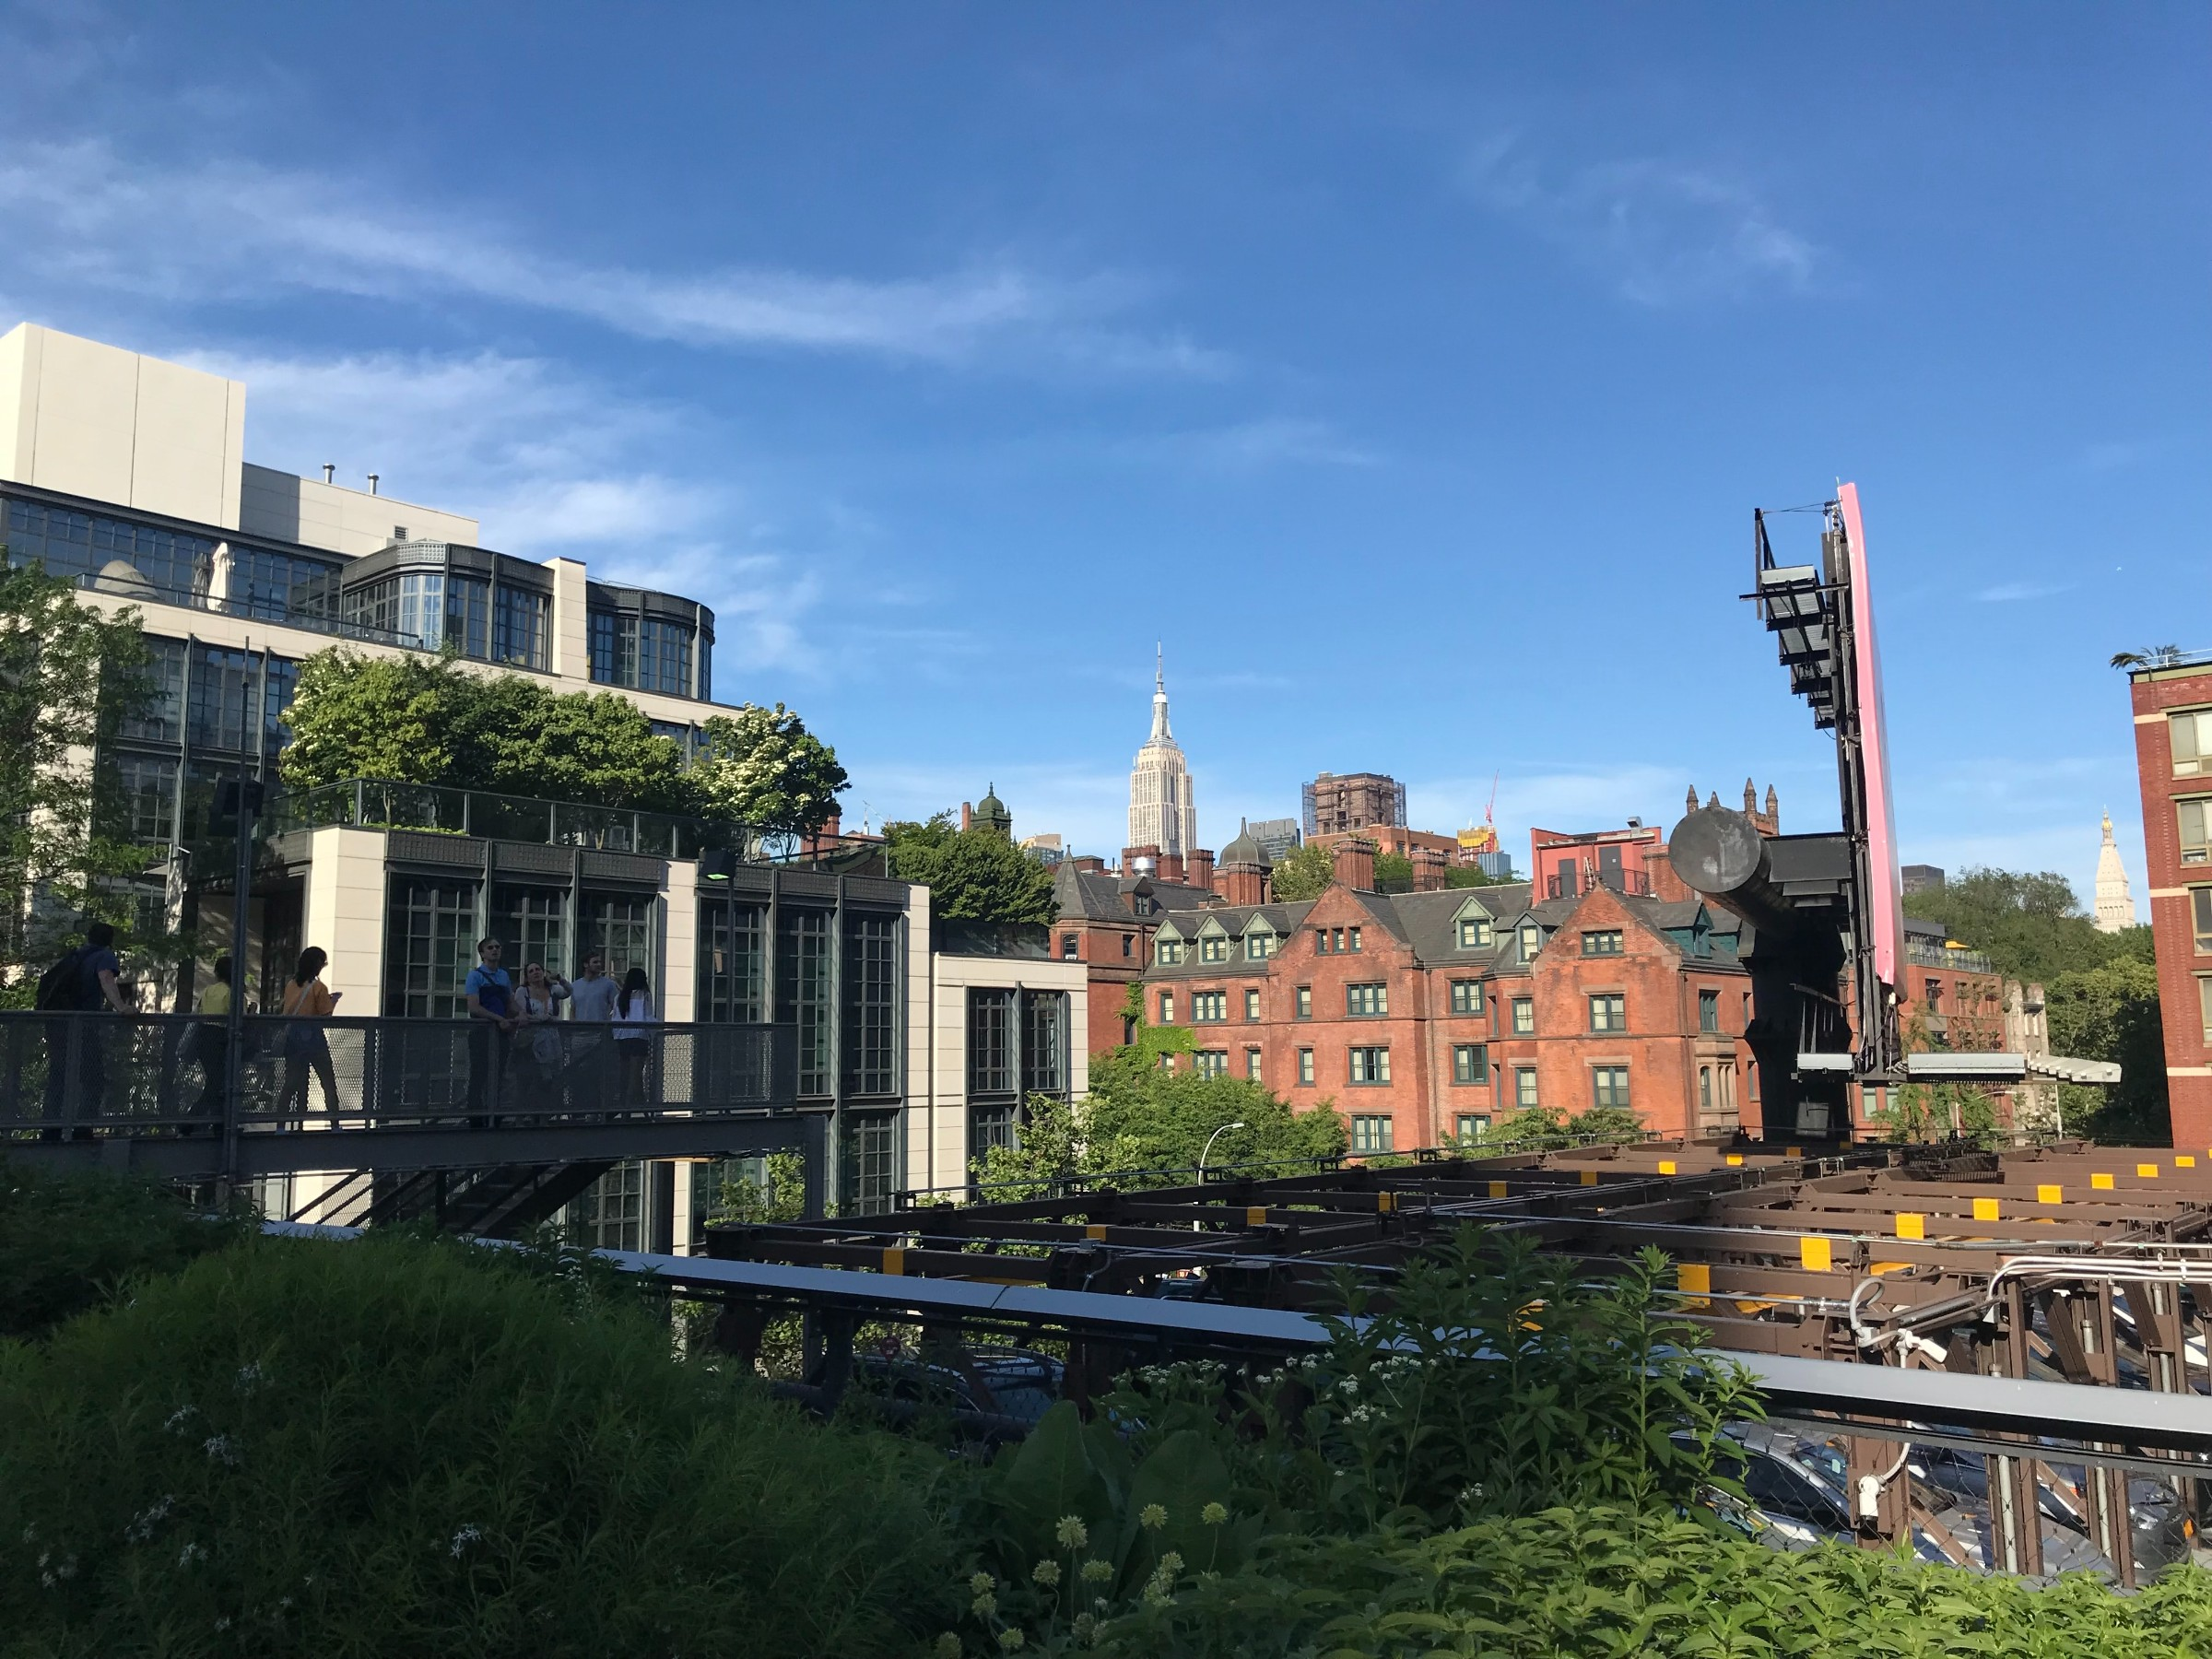 A view down the High Line near Hudson Yards